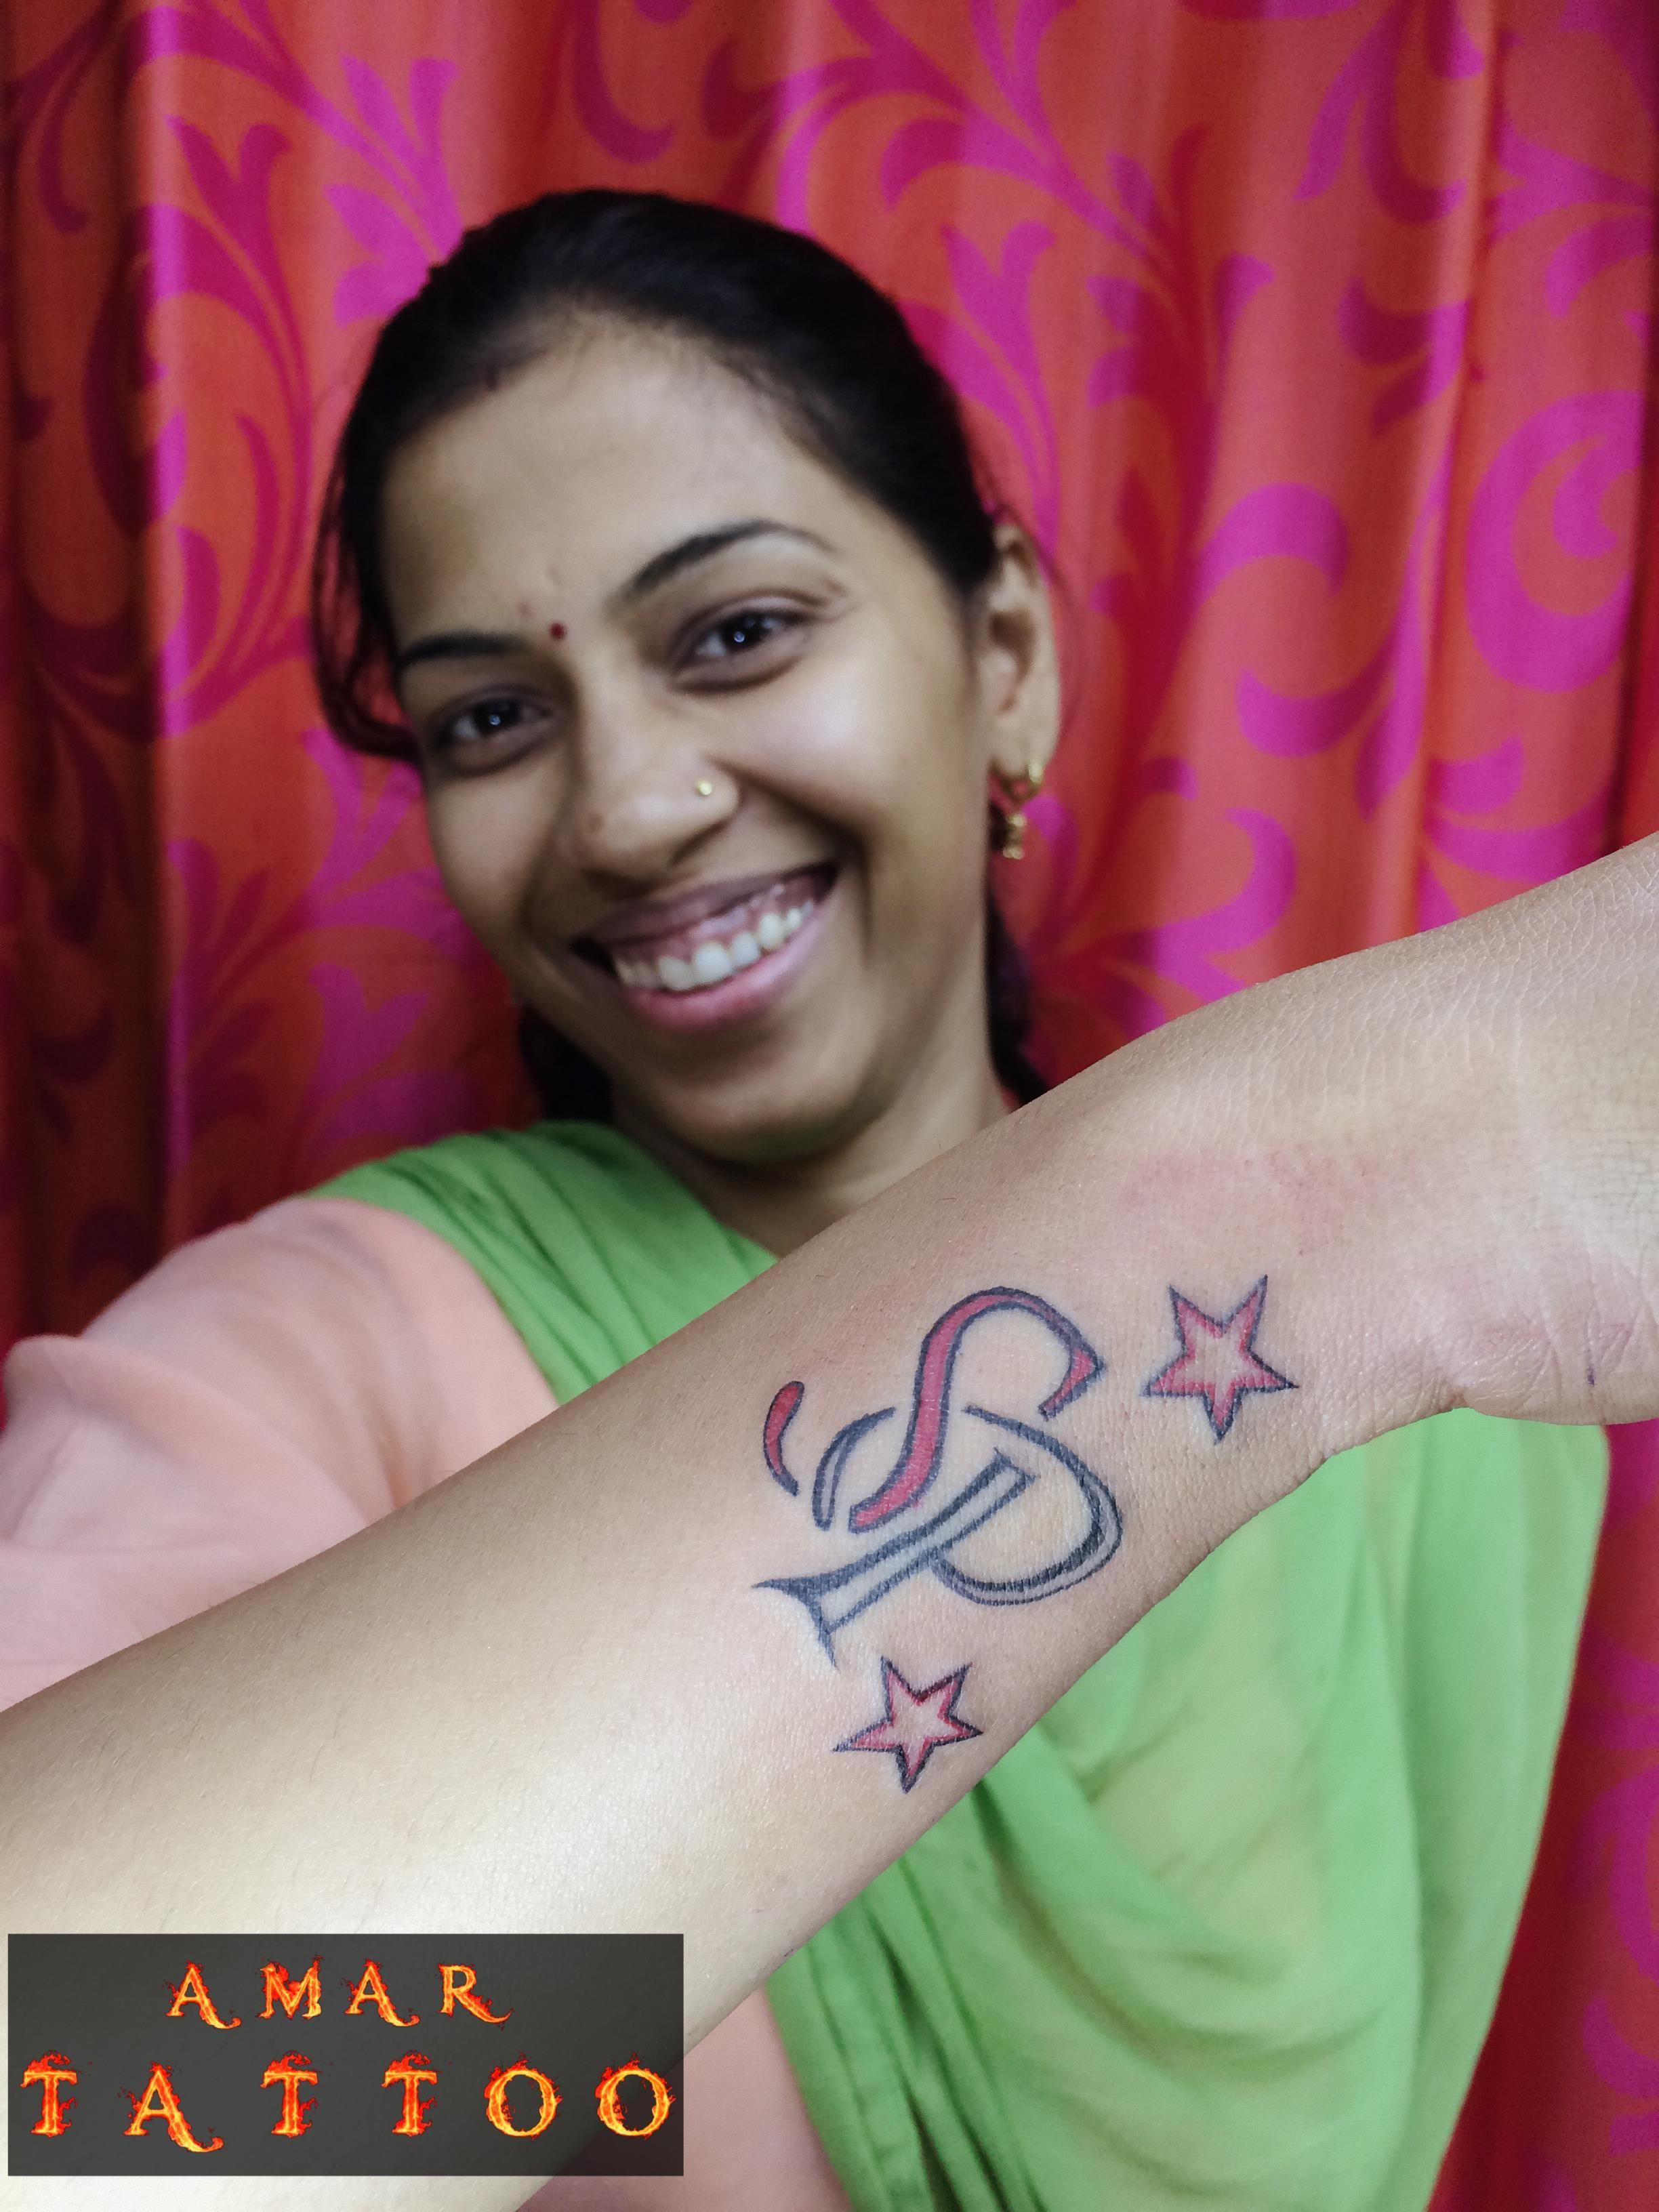 S P Name Tattoo Designs